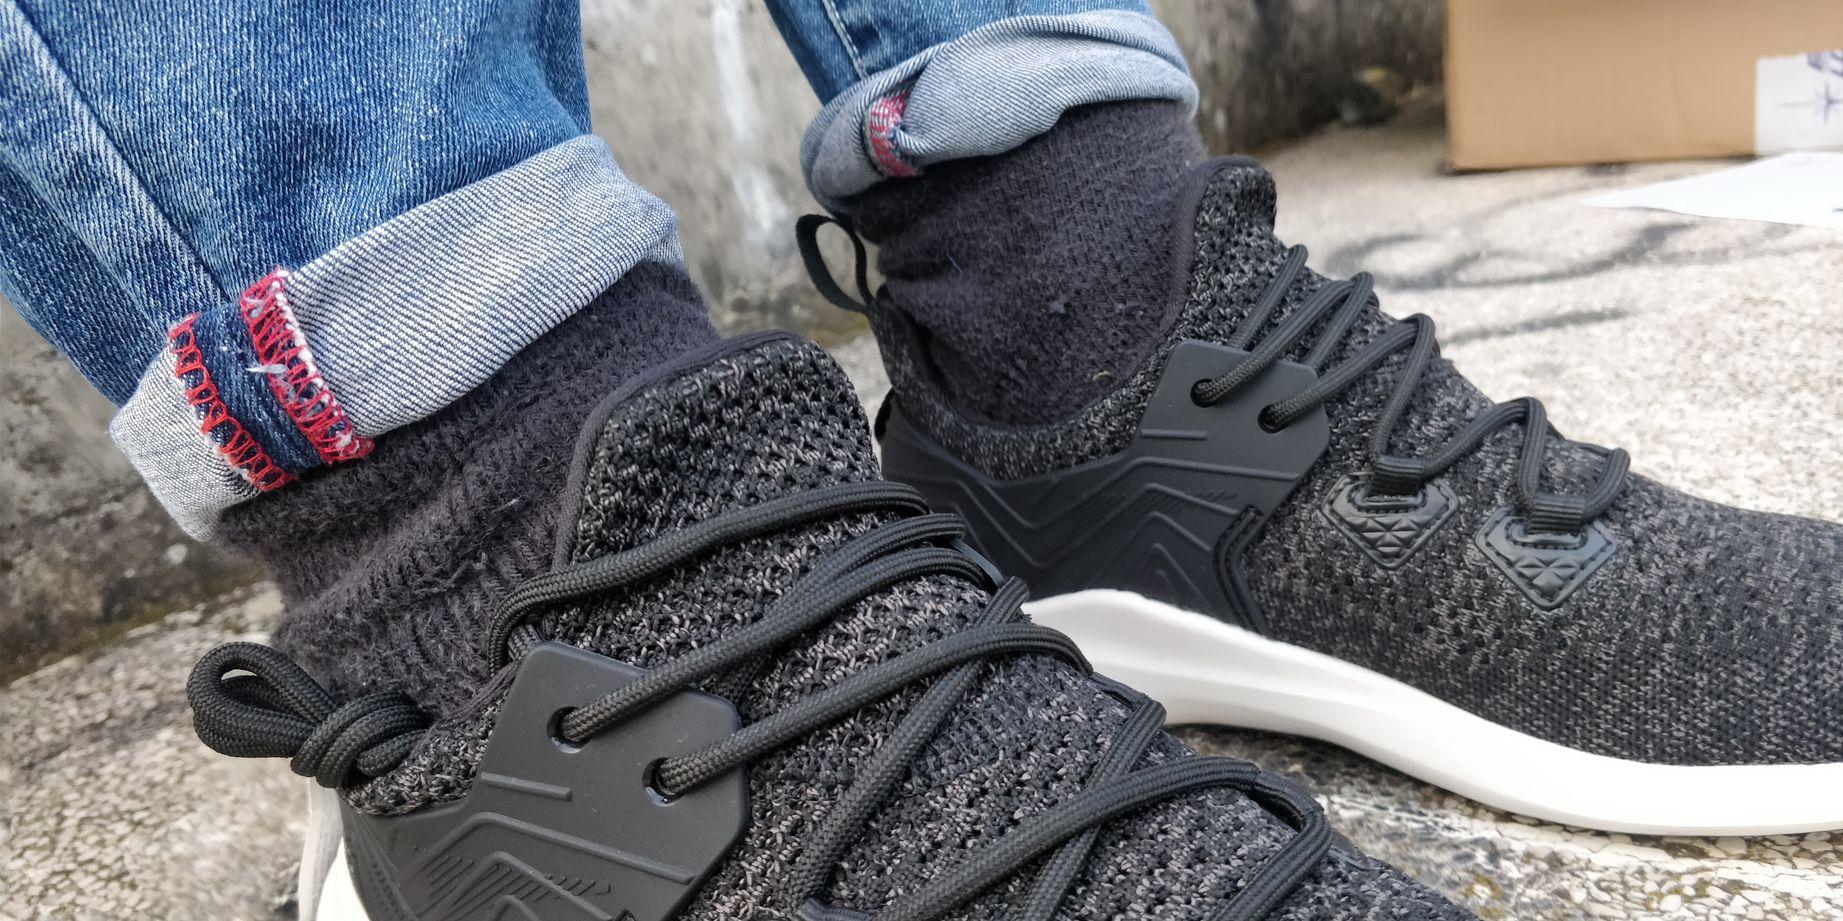 Joma-Scarpe-sportive-Sneakers-Lifestyle-sportswear-Nero-JCSM-mesh miniatura 3